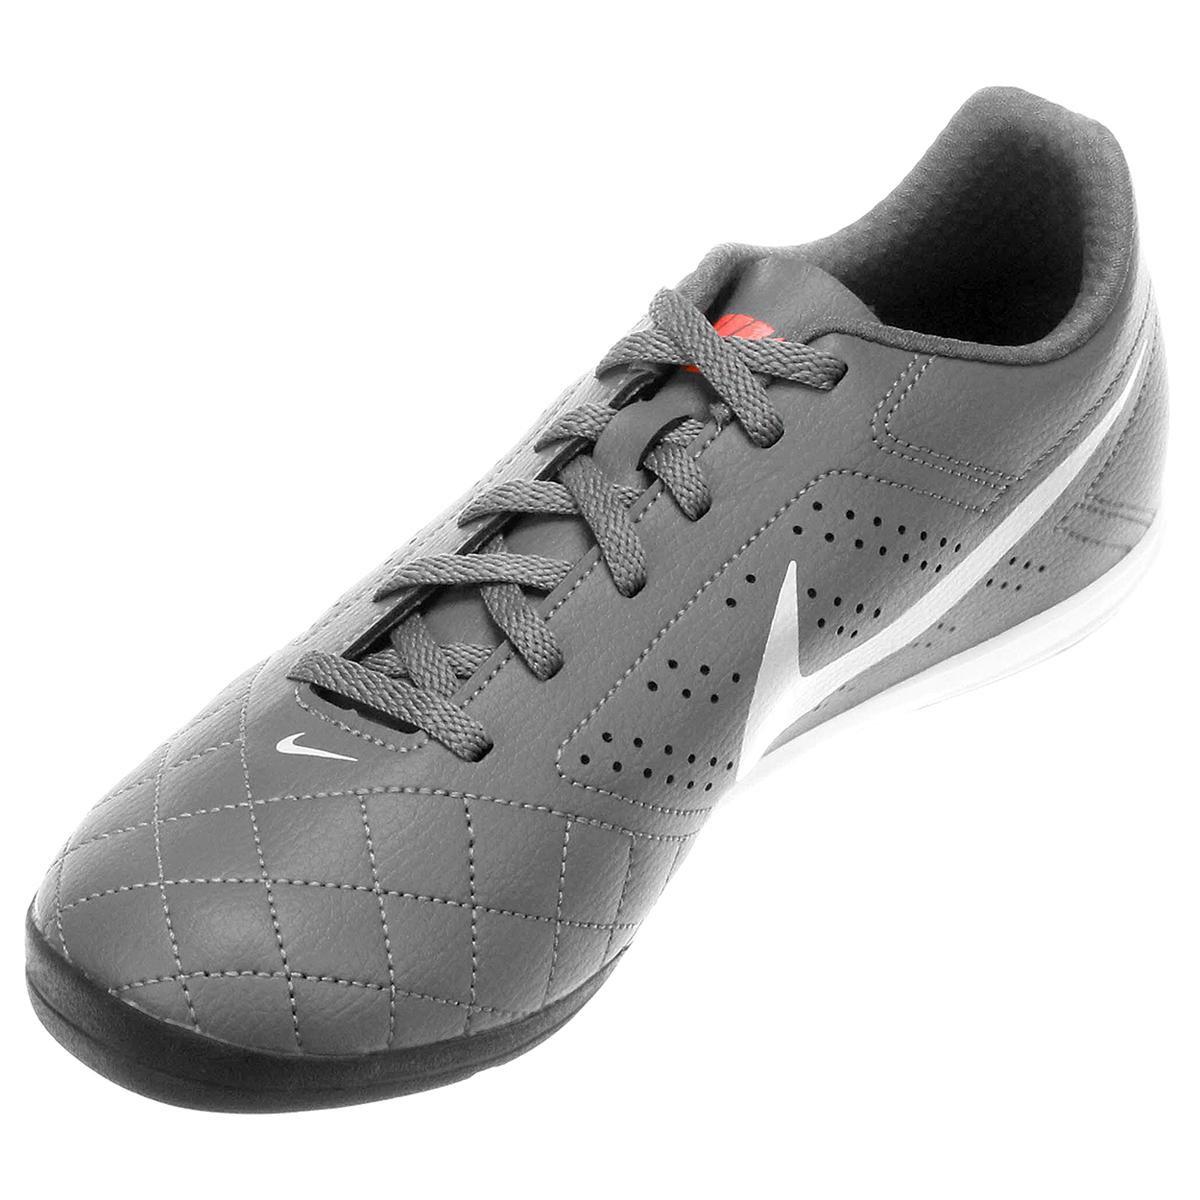 Chuteira Futsal Nike Beco 2 Cinza Compre Agora Dafiti 87d37b5ca9c6d